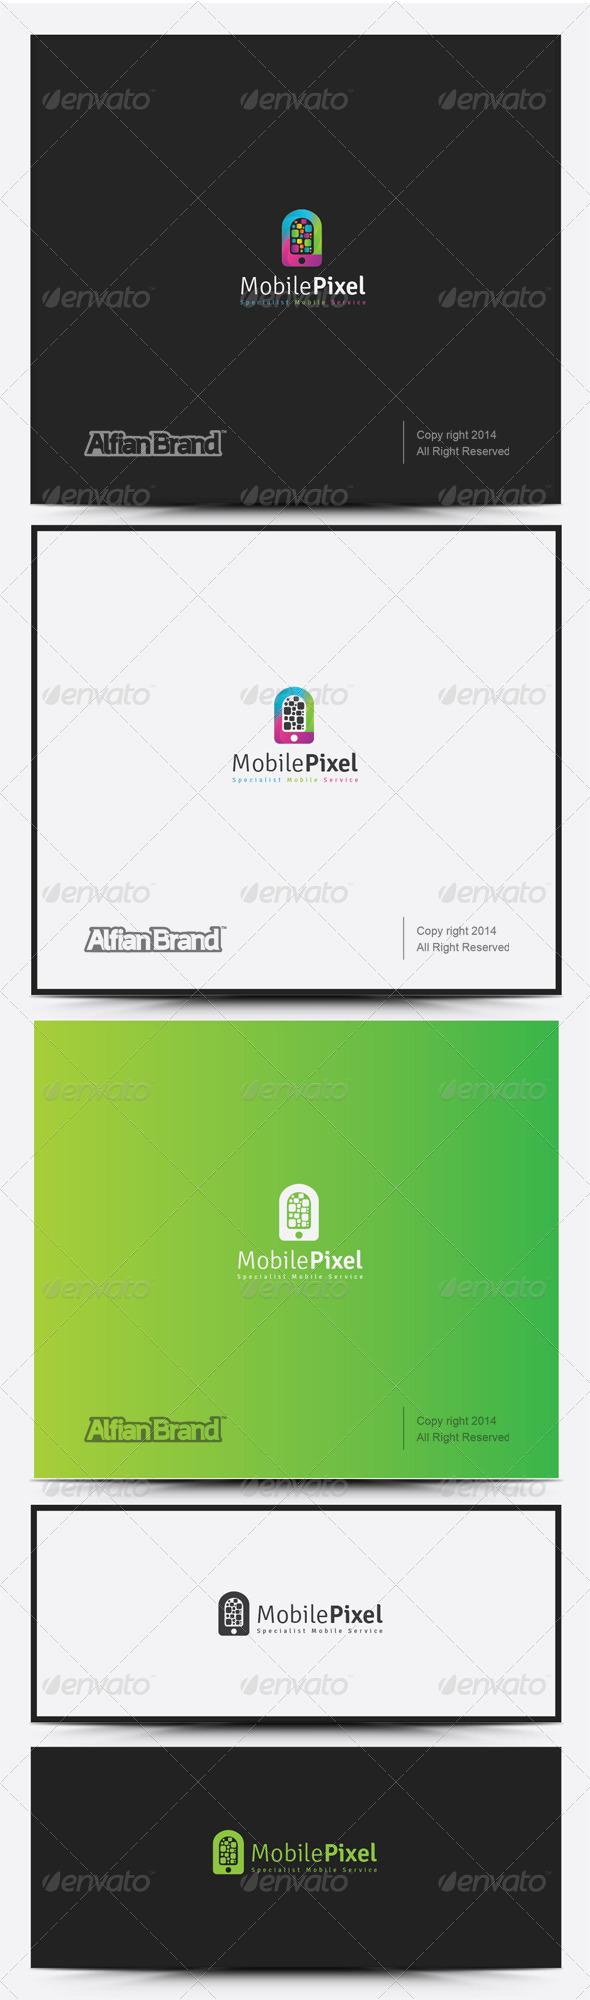 GraphicRiver Mobile Pixel Logo 8317875